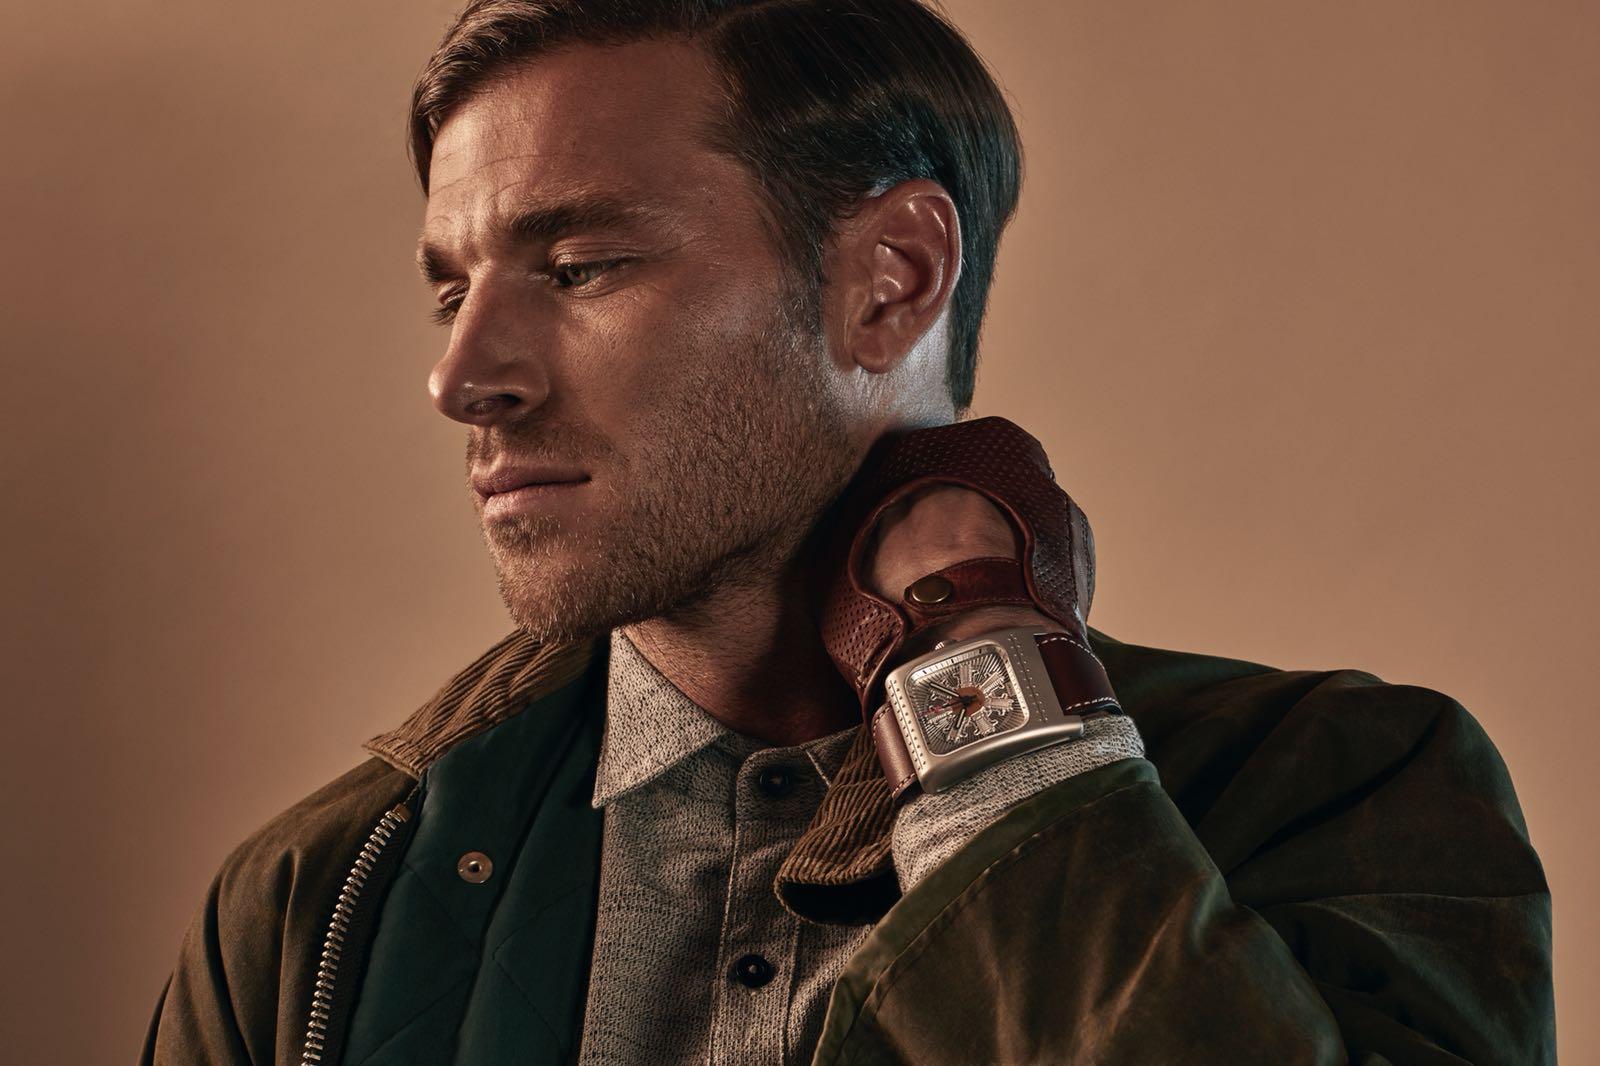 tockr--british-actor-david-frampton-shoots-tockr-watch-campaign